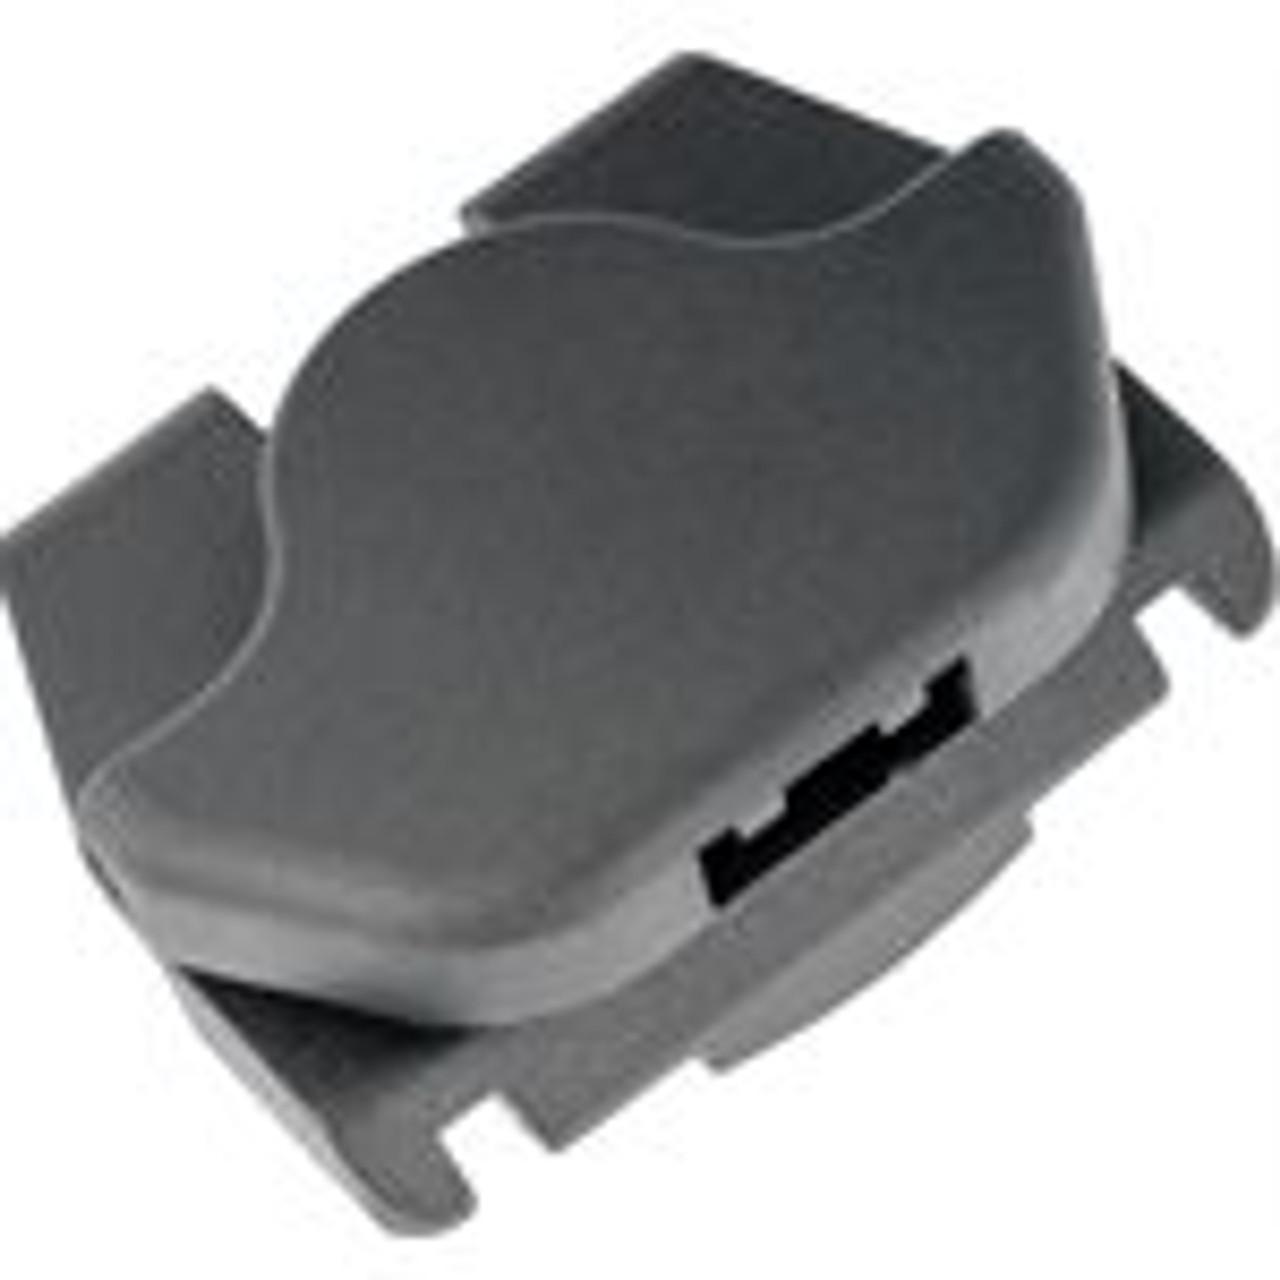 Description : Fender Liner Moulding Clip Material : Nylon Color : Black Width : 31MM Height : 11MM Nissan OEM# 01553-05233 25 Per Box